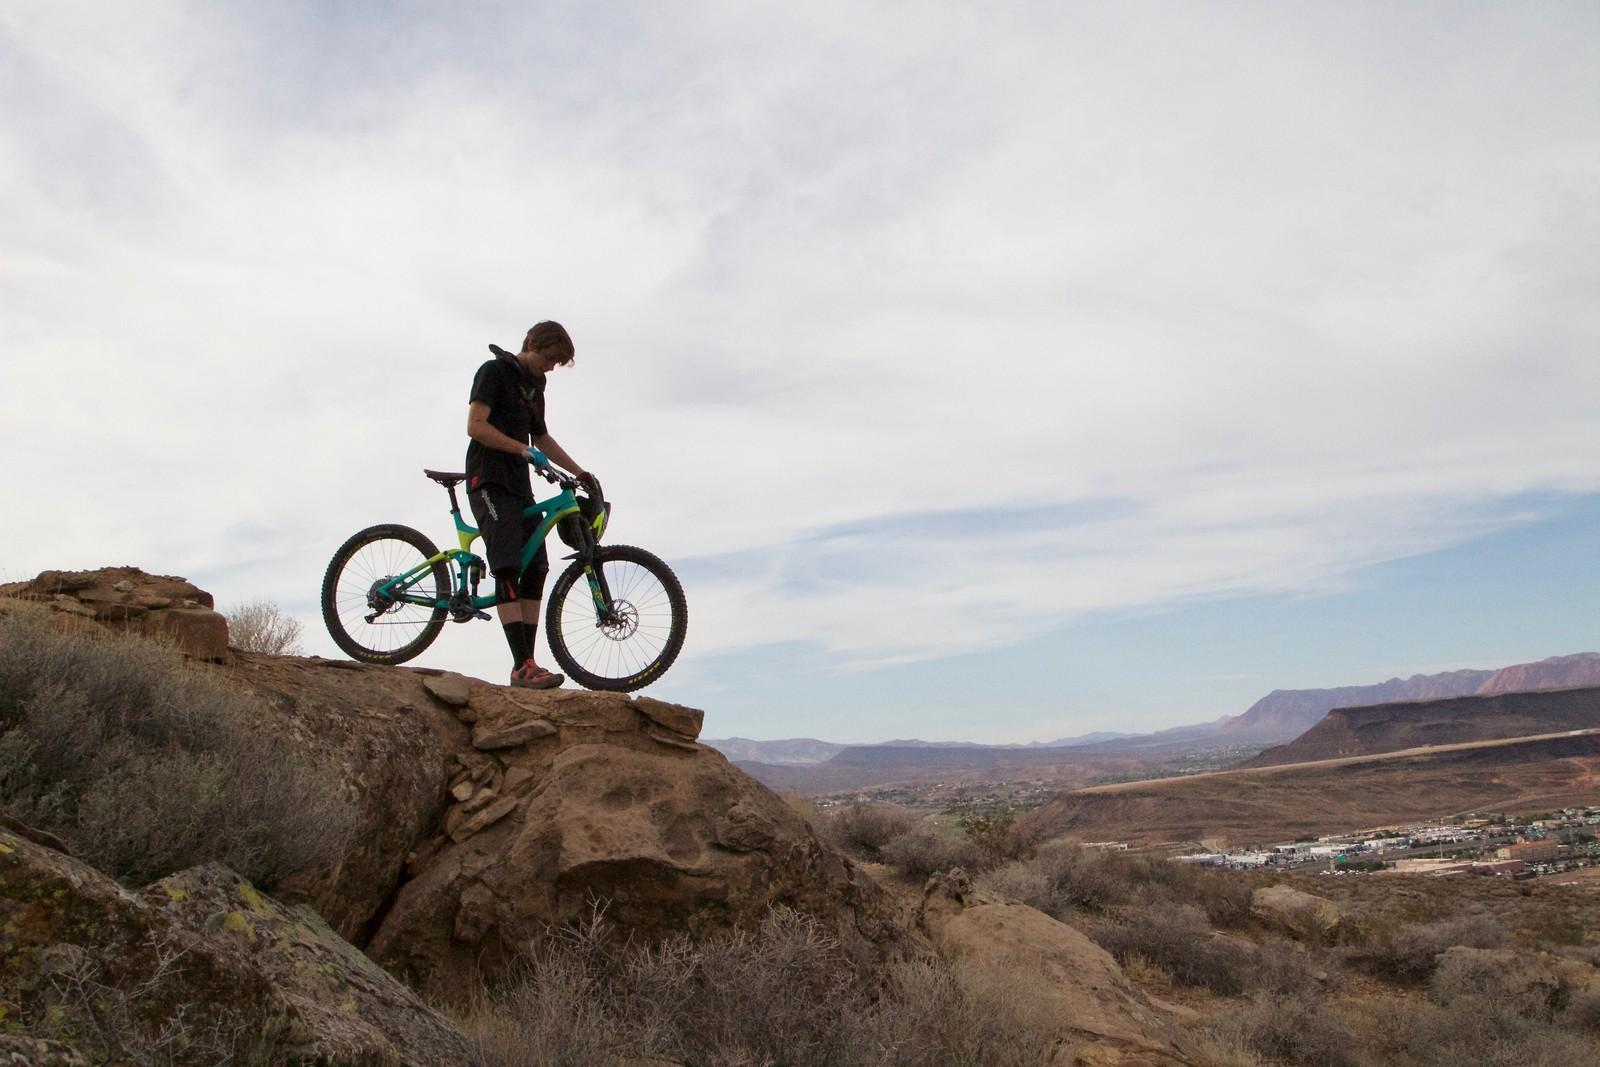 IMG 0265 - eastonllewelyn - Mountain Biking Pictures - Vital MTB